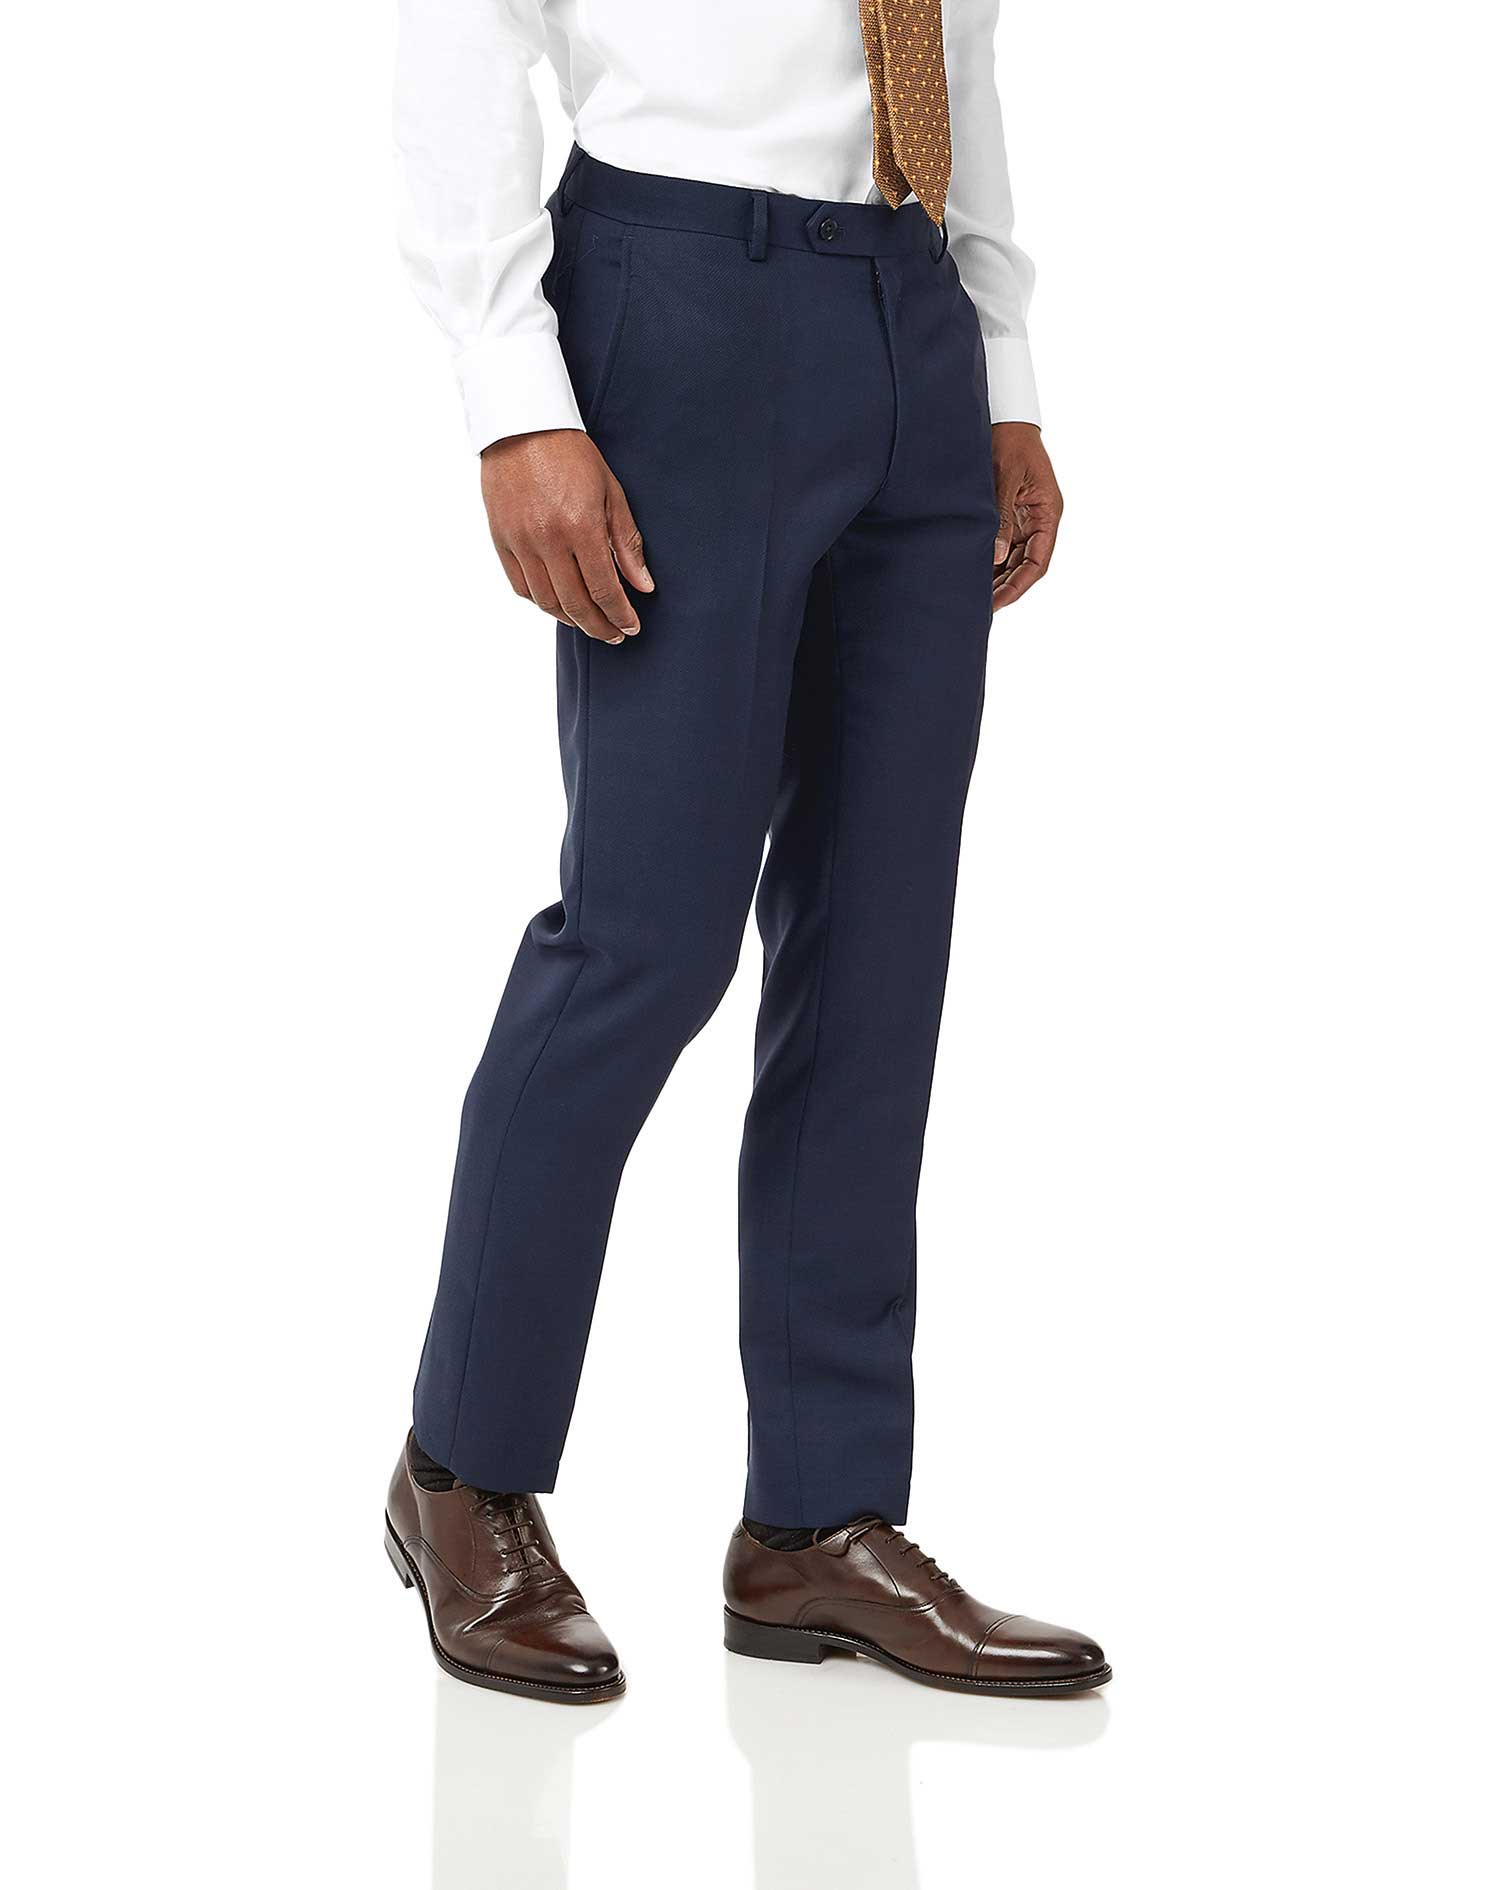 Ink Blue Slim Fit Birdseye Travel Suit Trousers Size W34 L38 by Charles Tyrwhitt